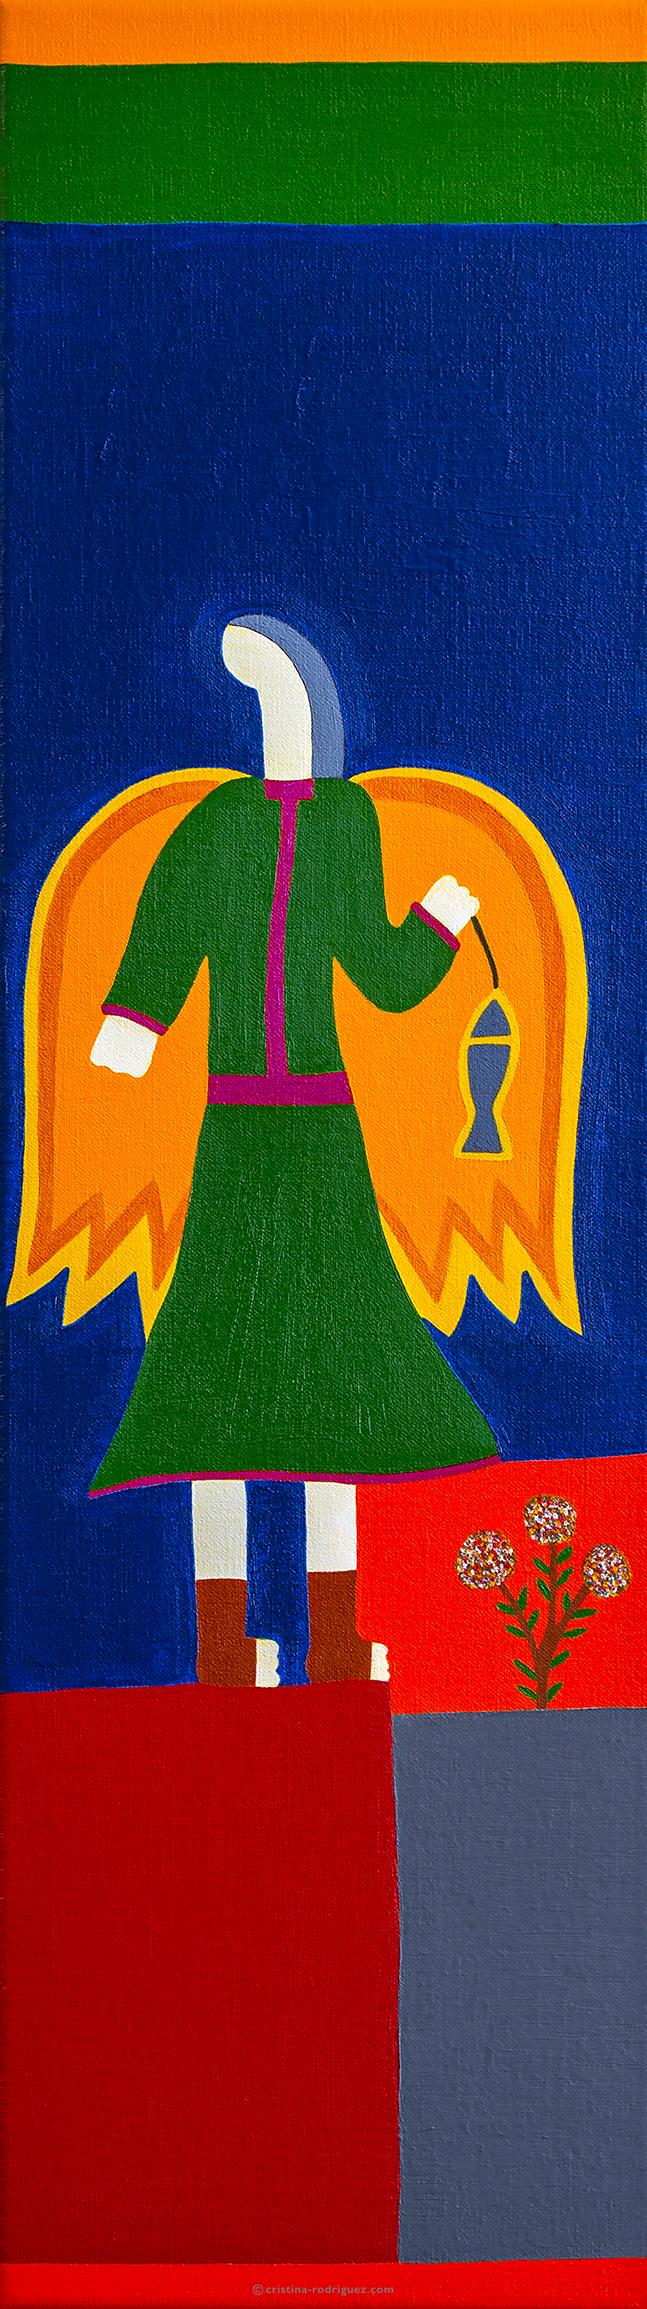 Saint Raphaël Archangel